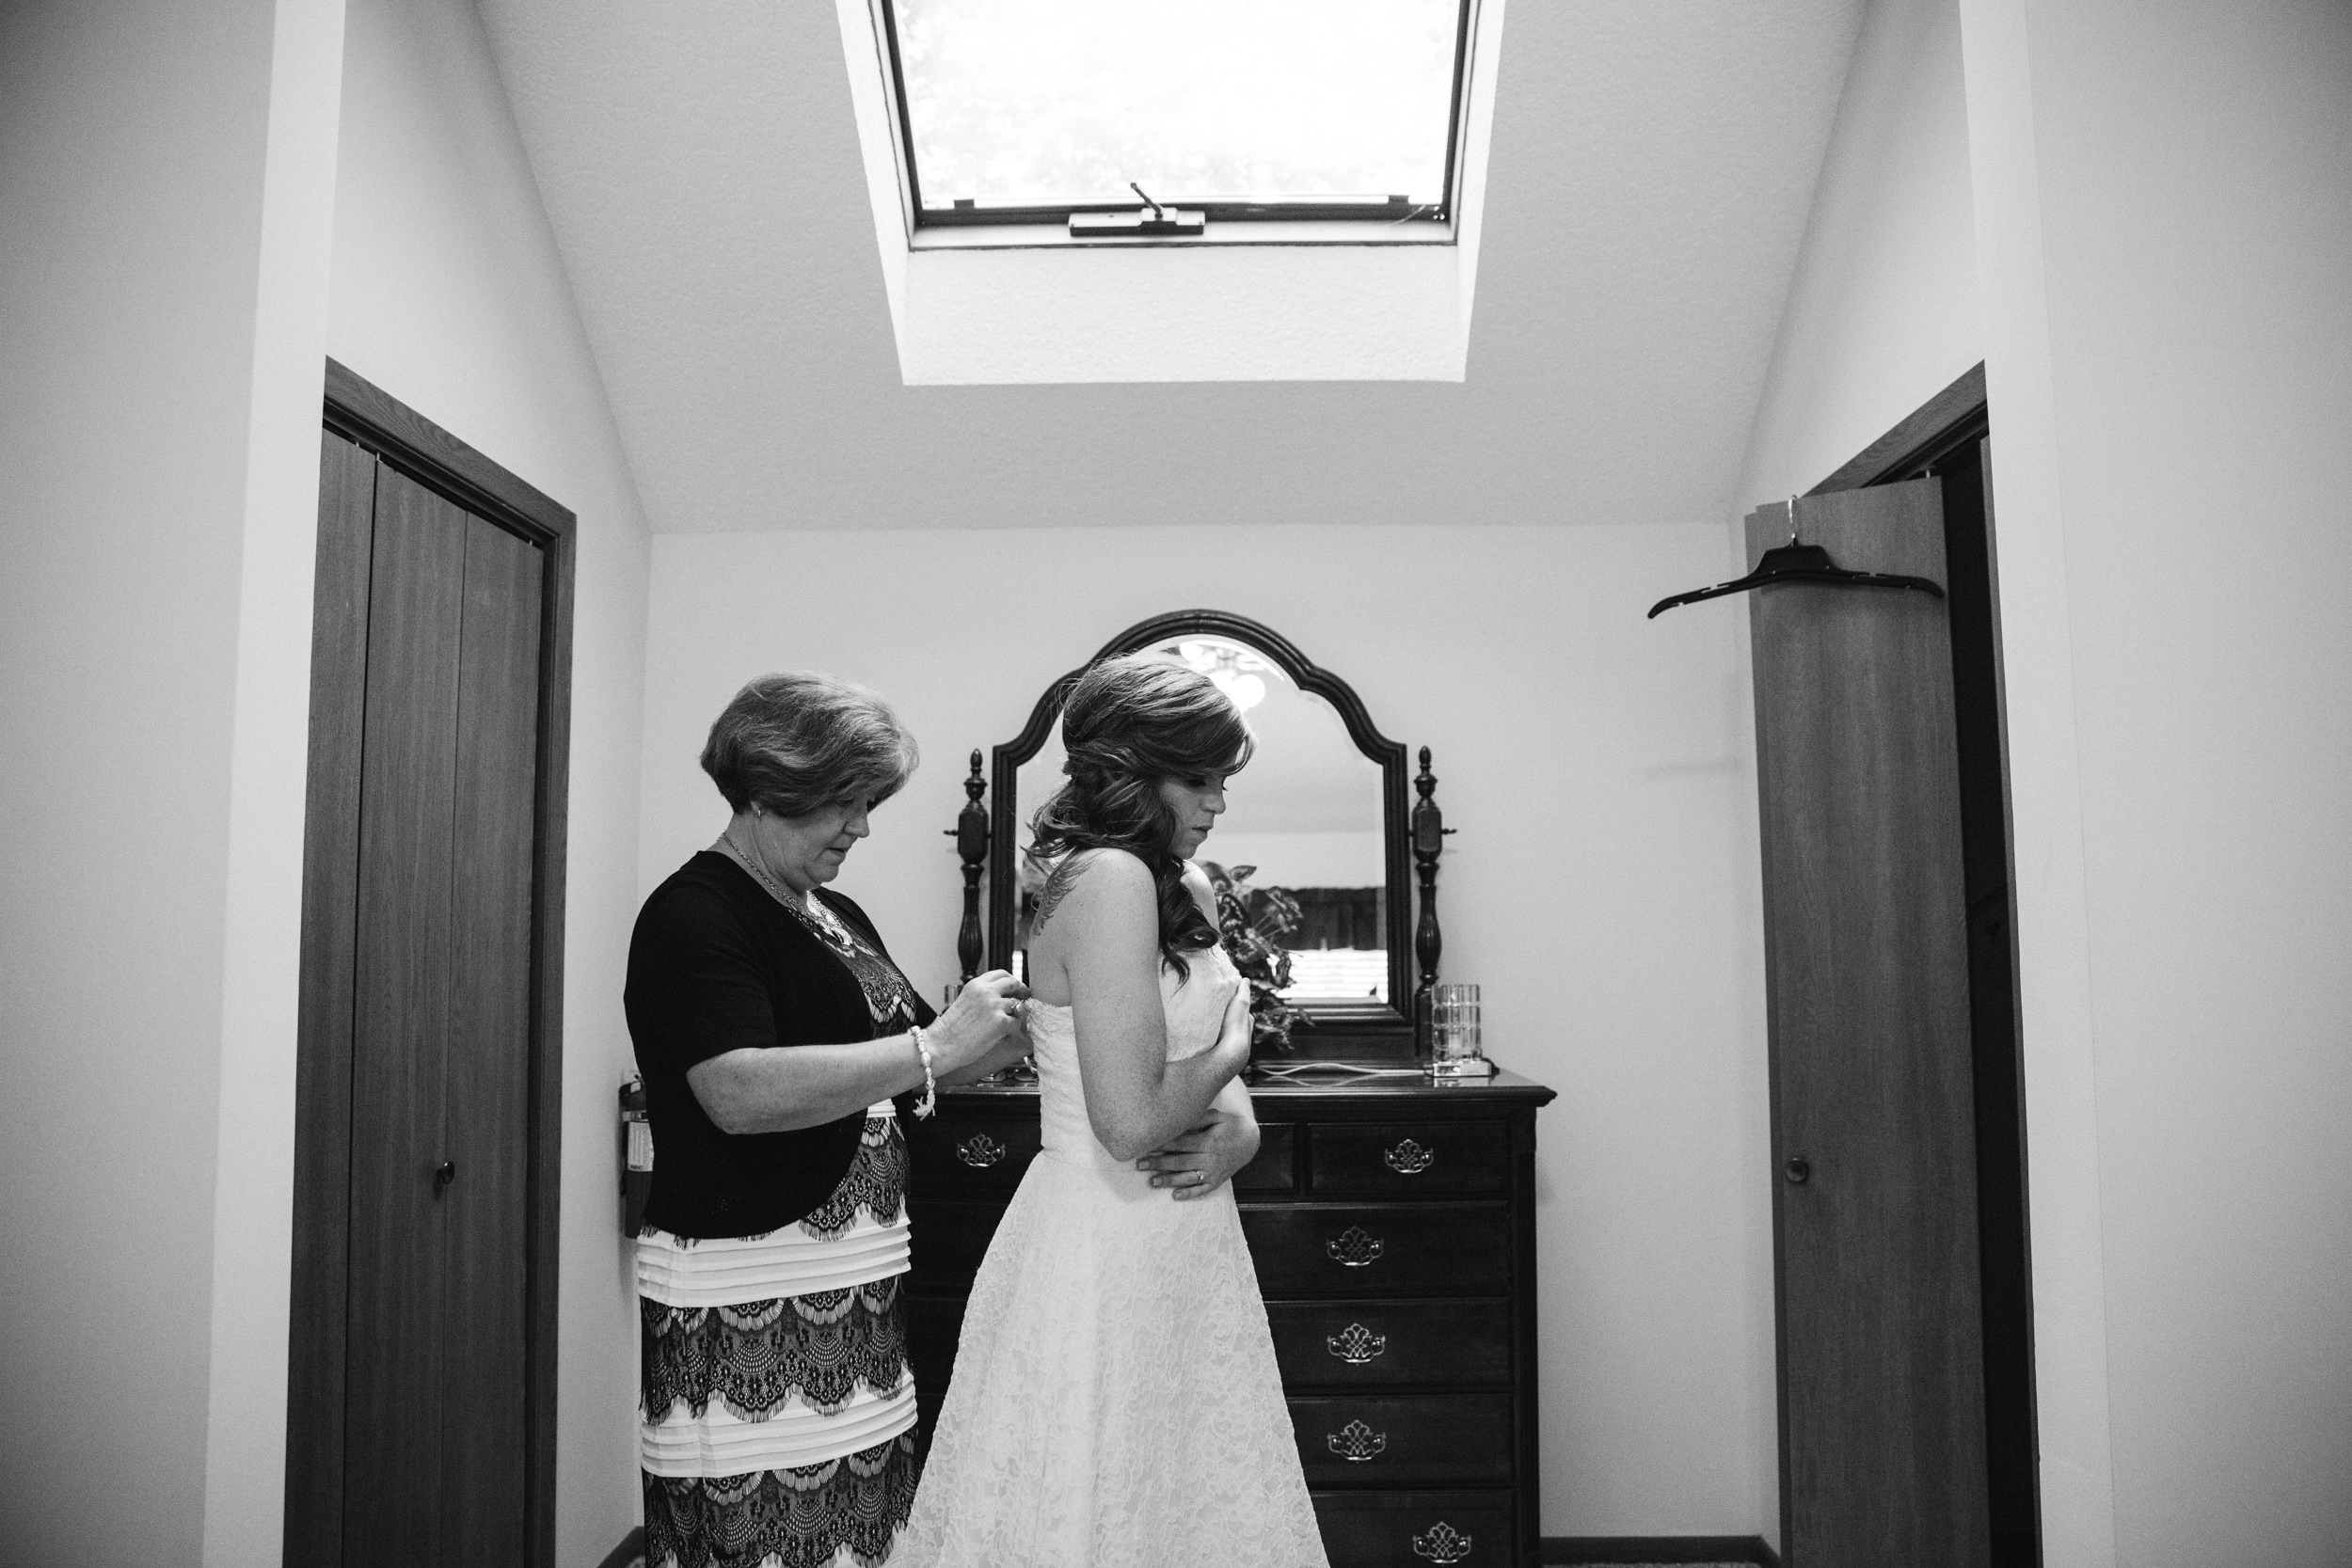 7-25-2015 Sarah and Jimmy's Eagle Ridge Downtown Galena Wedding-115.jpg